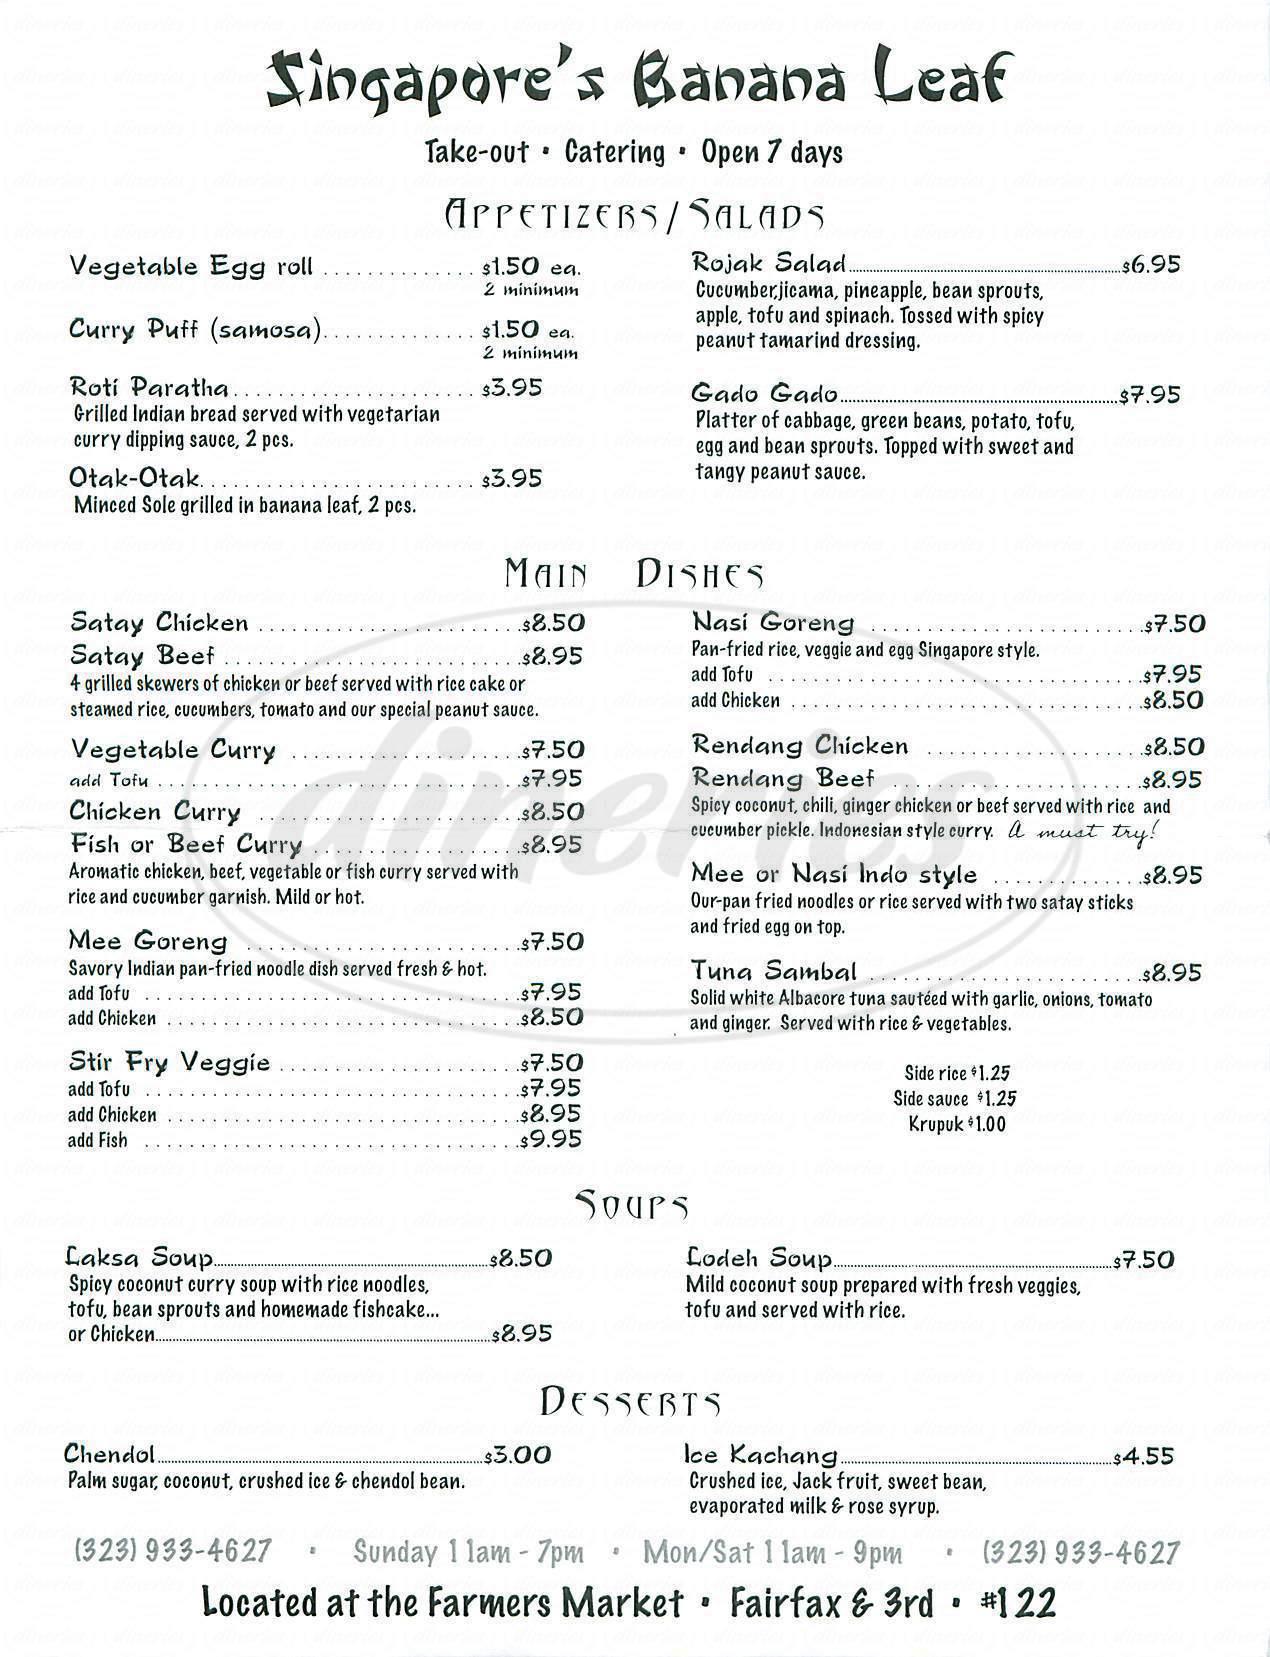 menu for Singapore's Banana Leaf